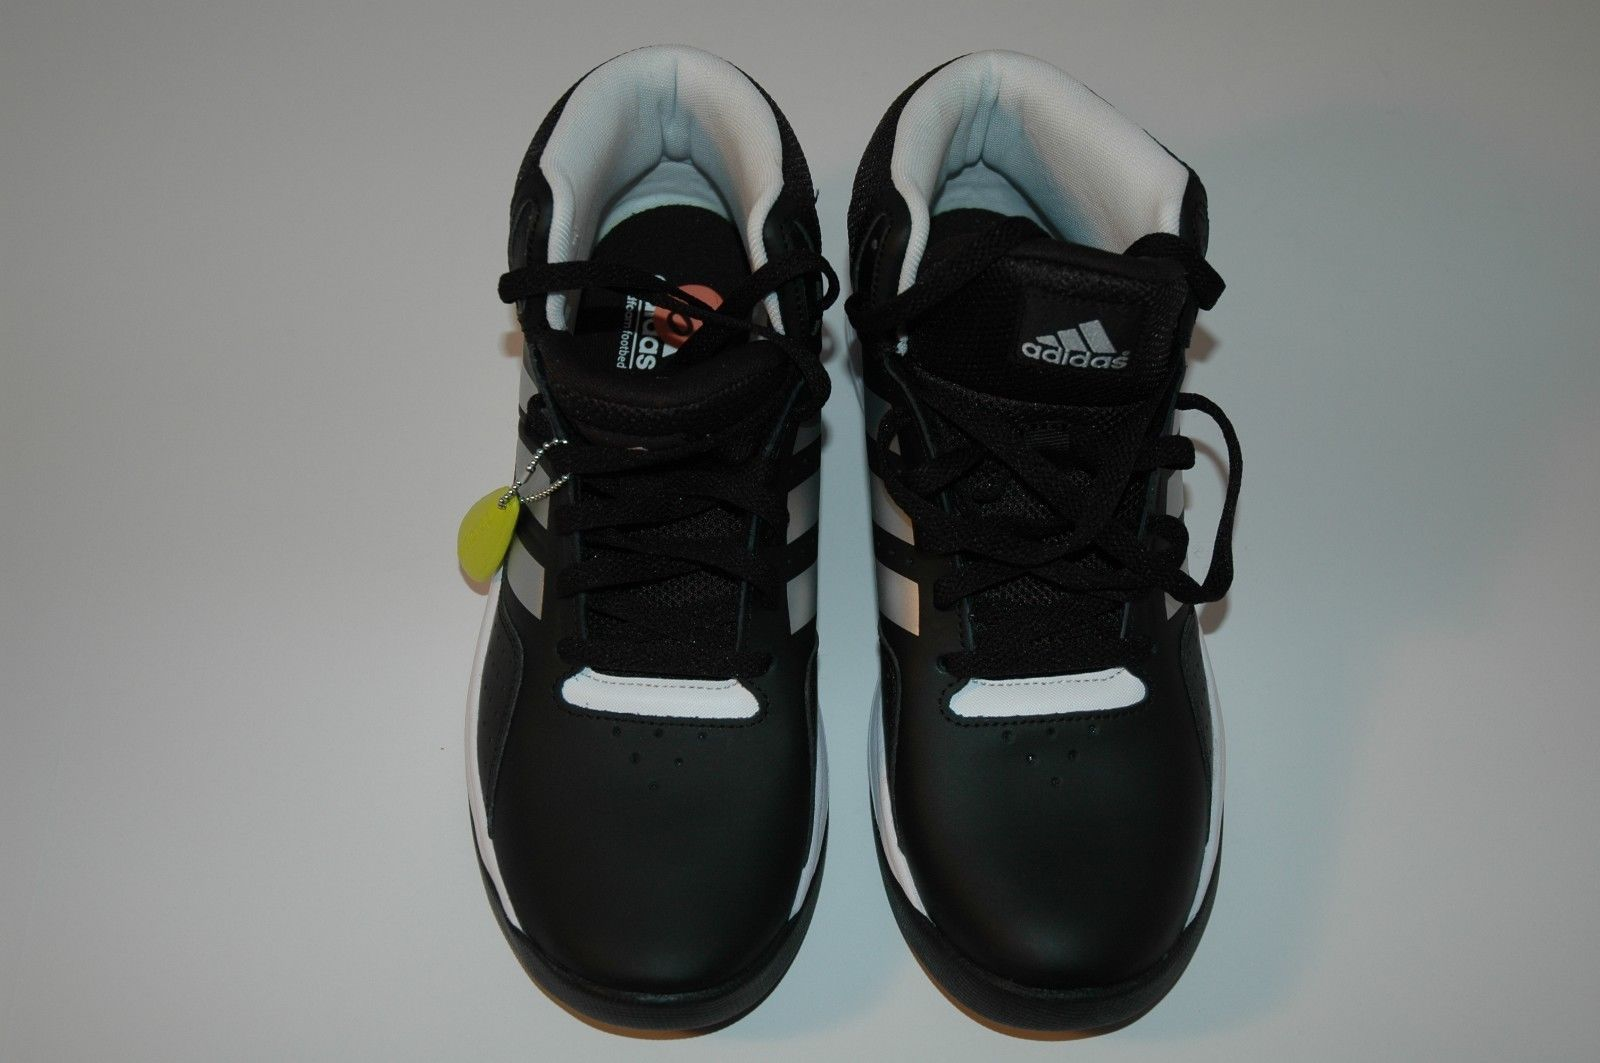 4ef08acd2f08 Adidas Cloudfoam Ilation Mid Mens Black and 50 similar items. S l1600